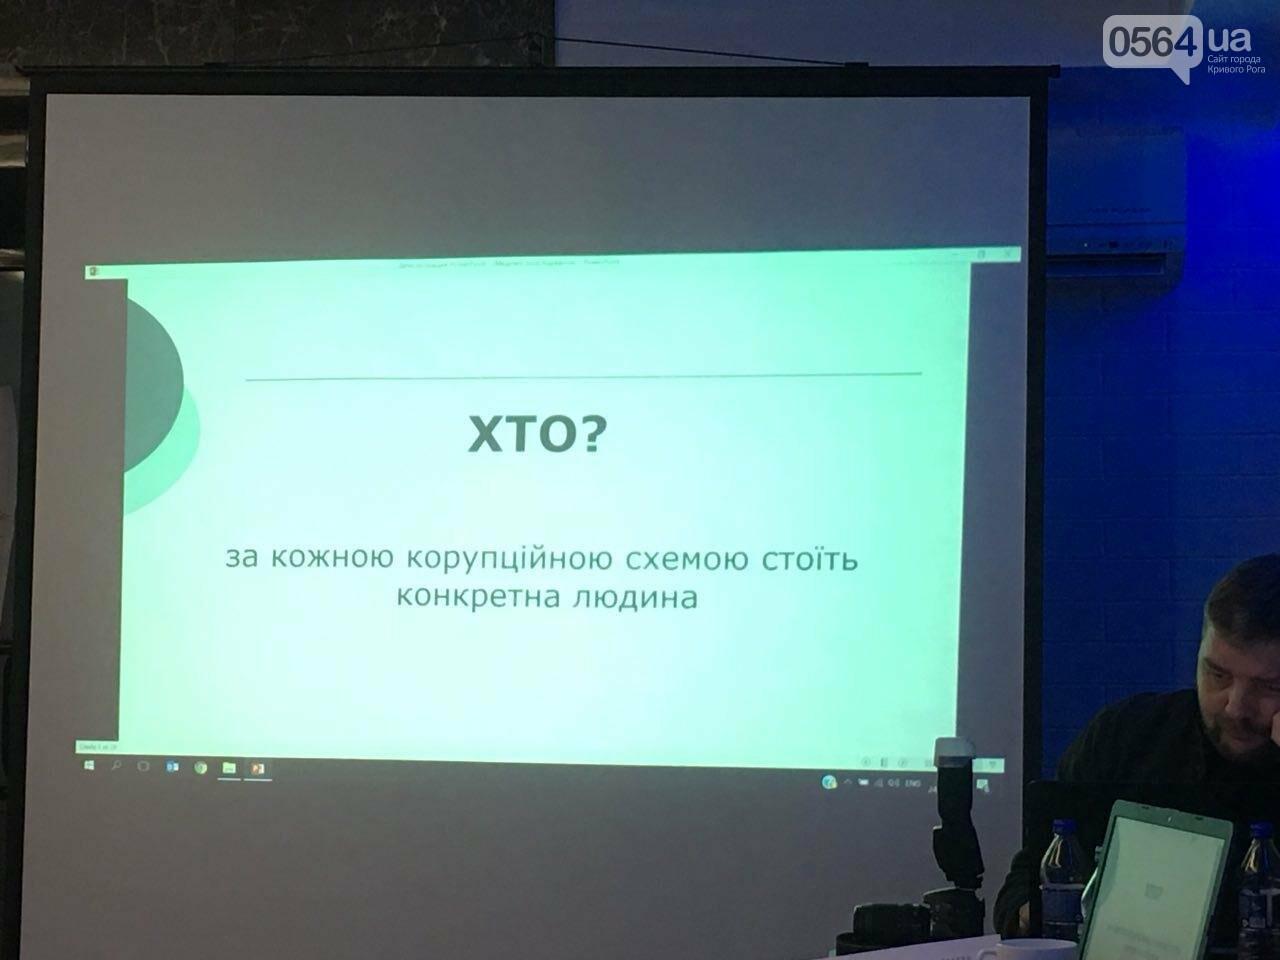 На тренинге о ВИЧ и медреформе криворожским журналистам рассказали о дискриминации и стереотипах, - ФОТО , фото-24